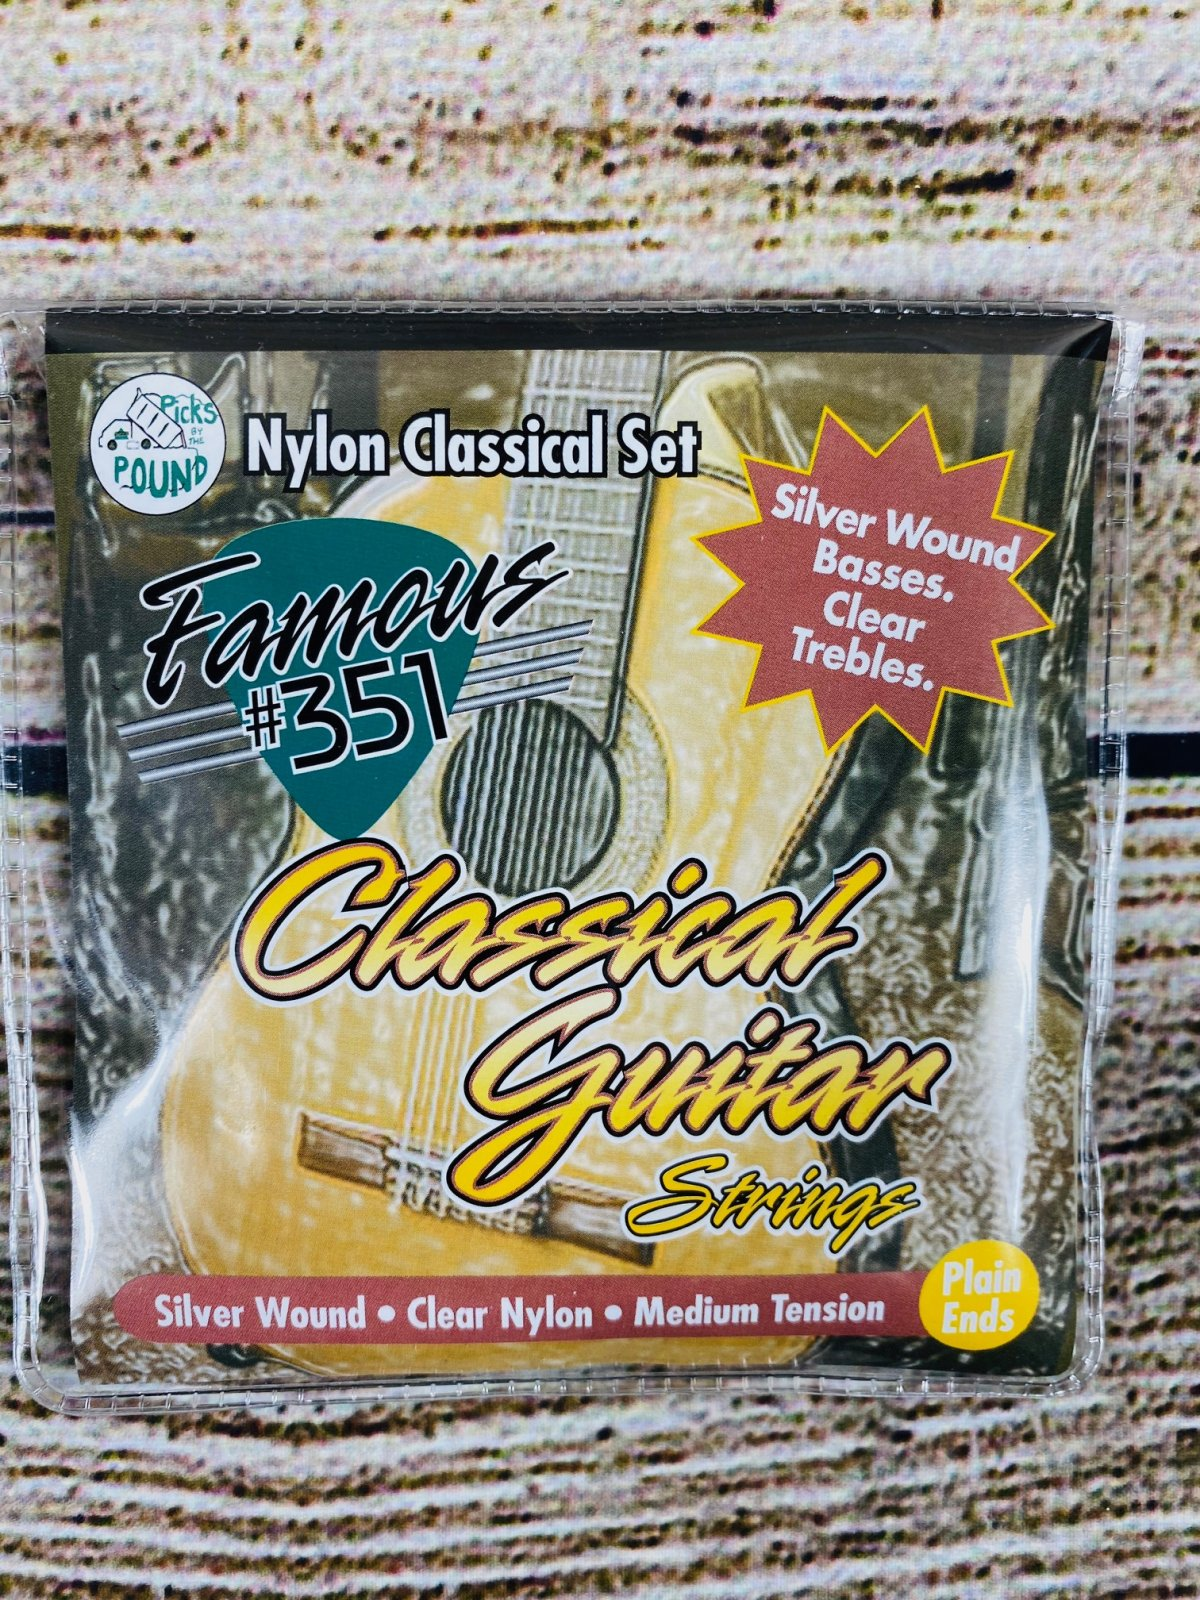 Famous #351 Nylon Classical Guitar Strings